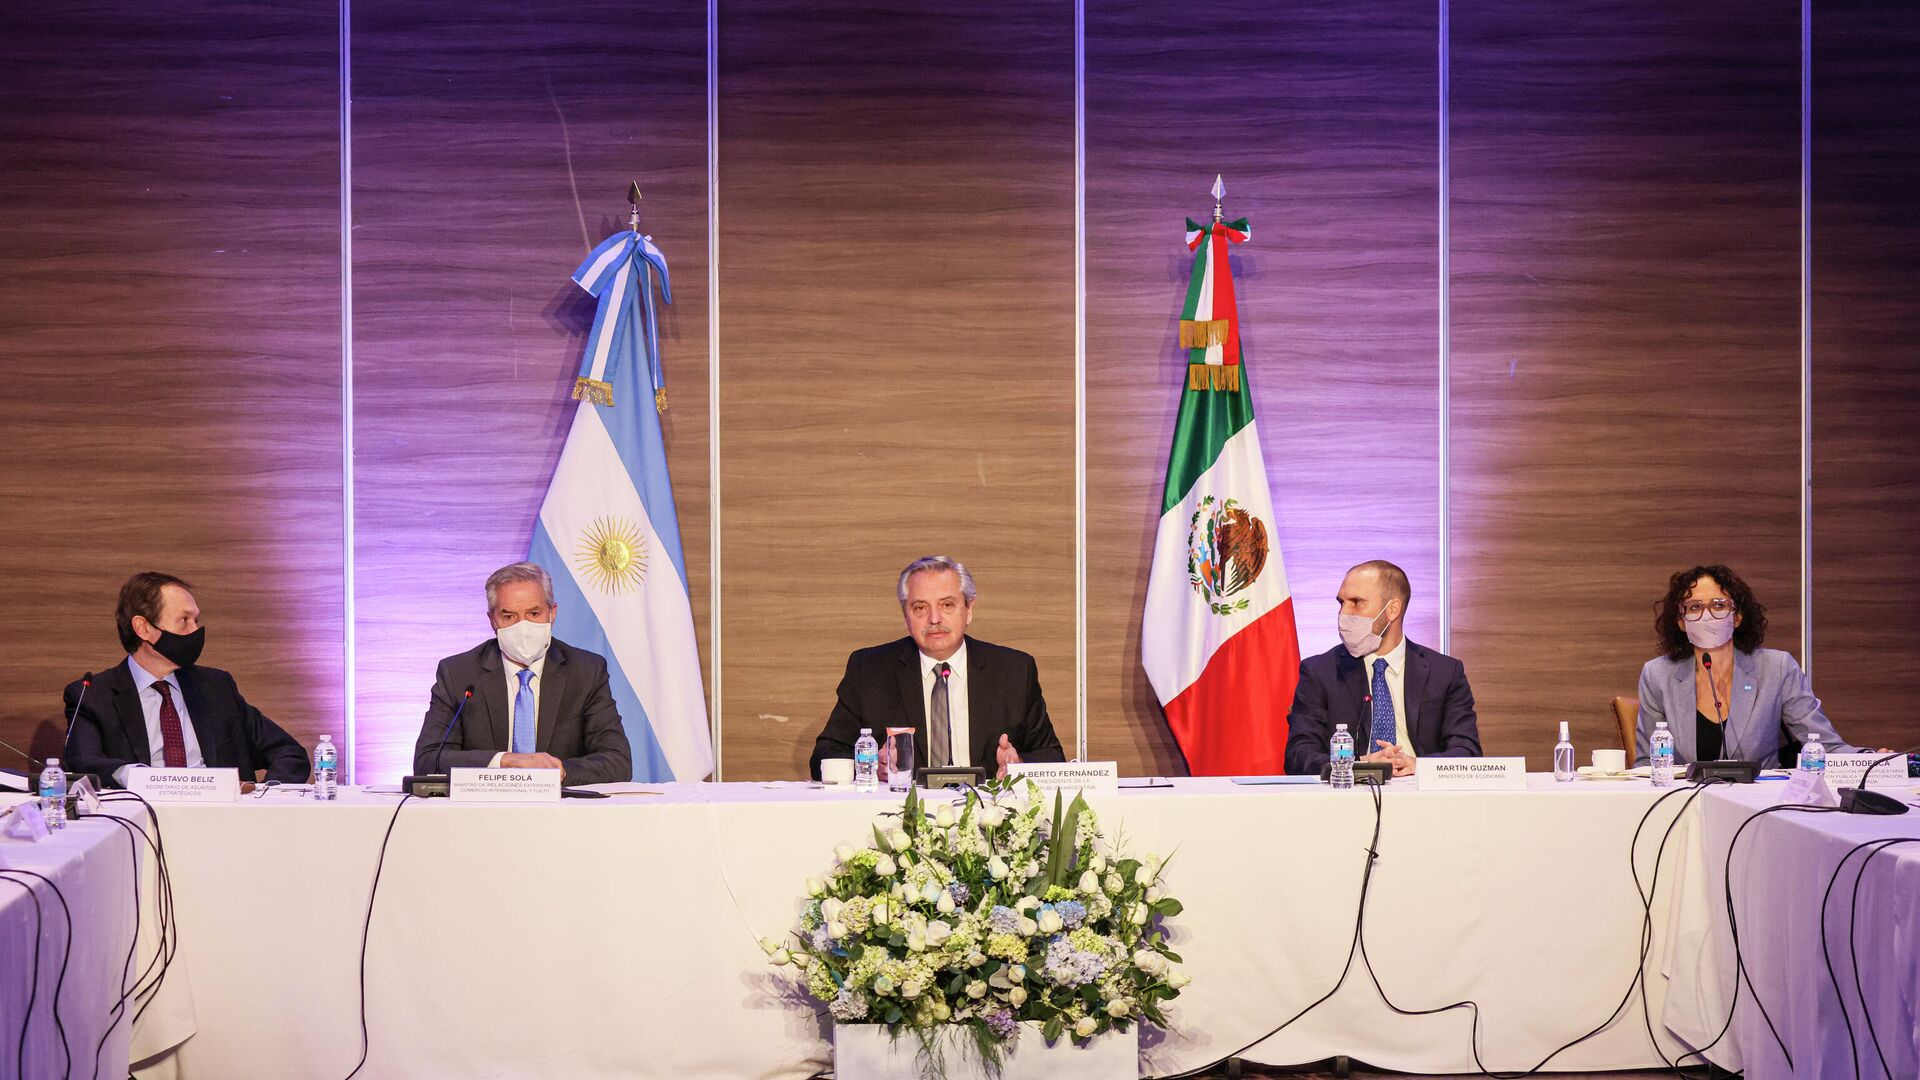 Presidente argentino Alberto Fernández en reunión con empresarios mexicanos - Sputnik Mundo, 1920, 22.02.2021